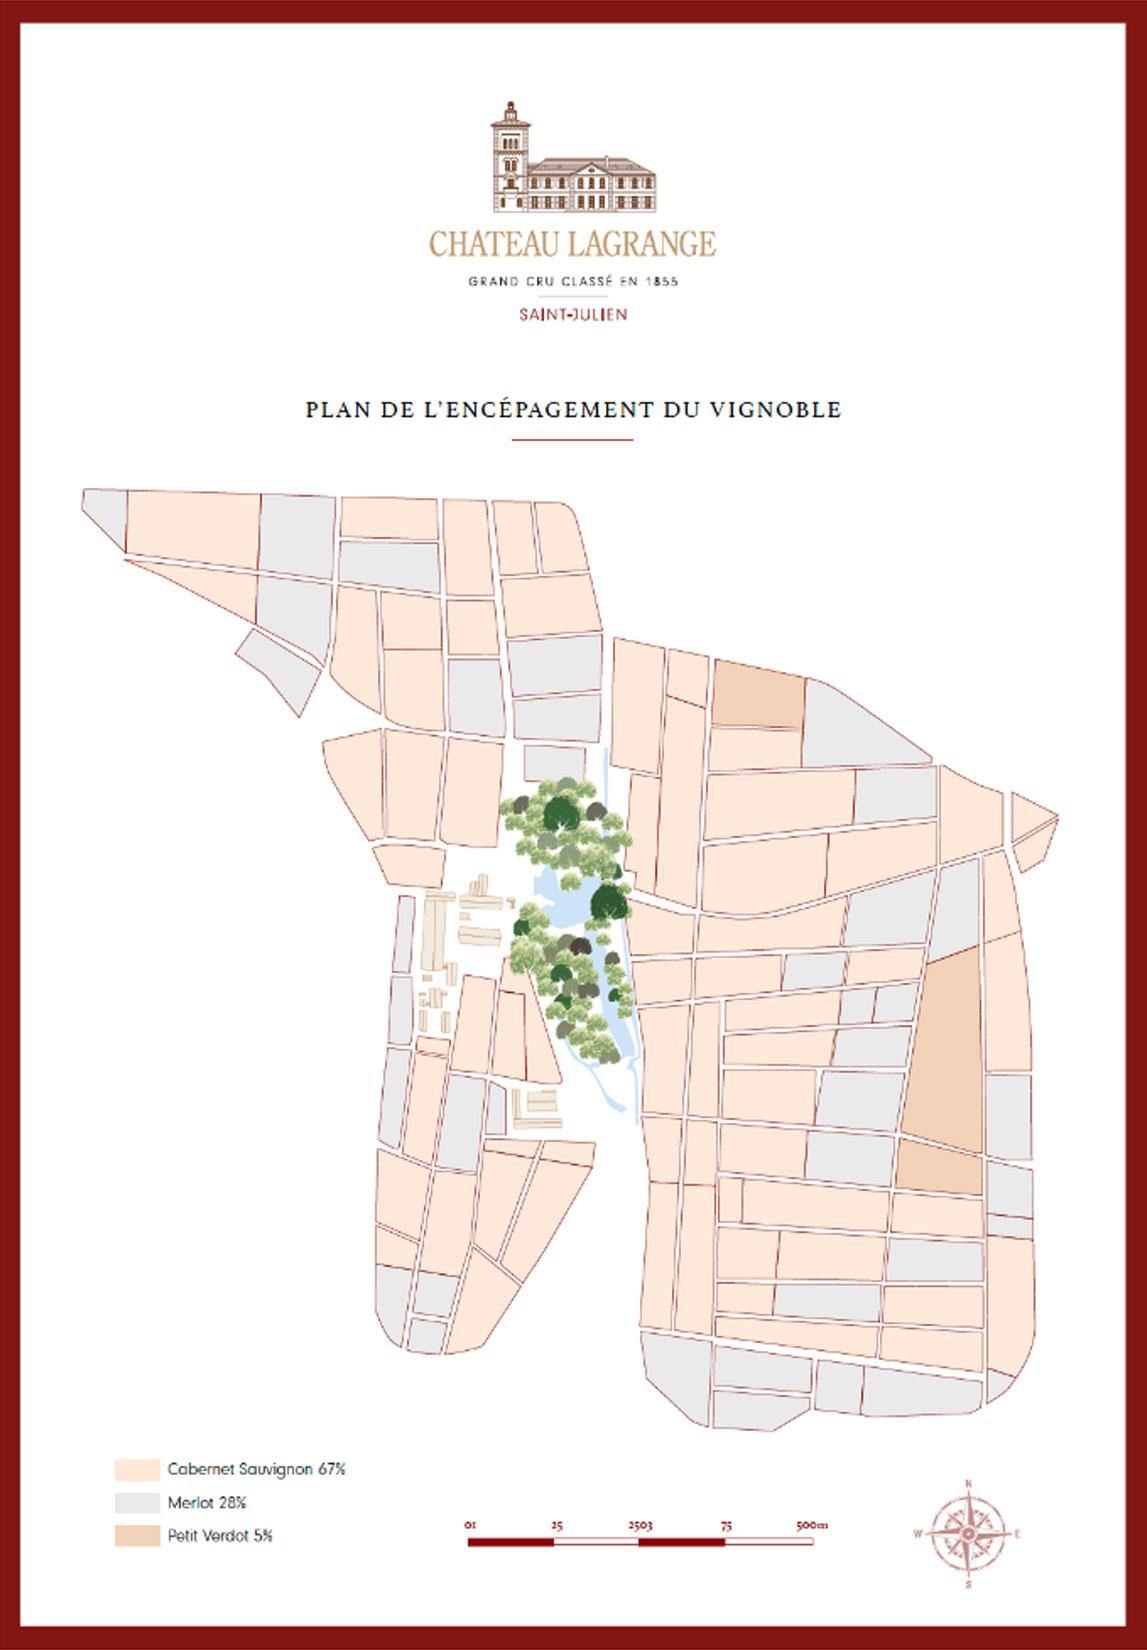 plan-encepagement-chateau-lagrange